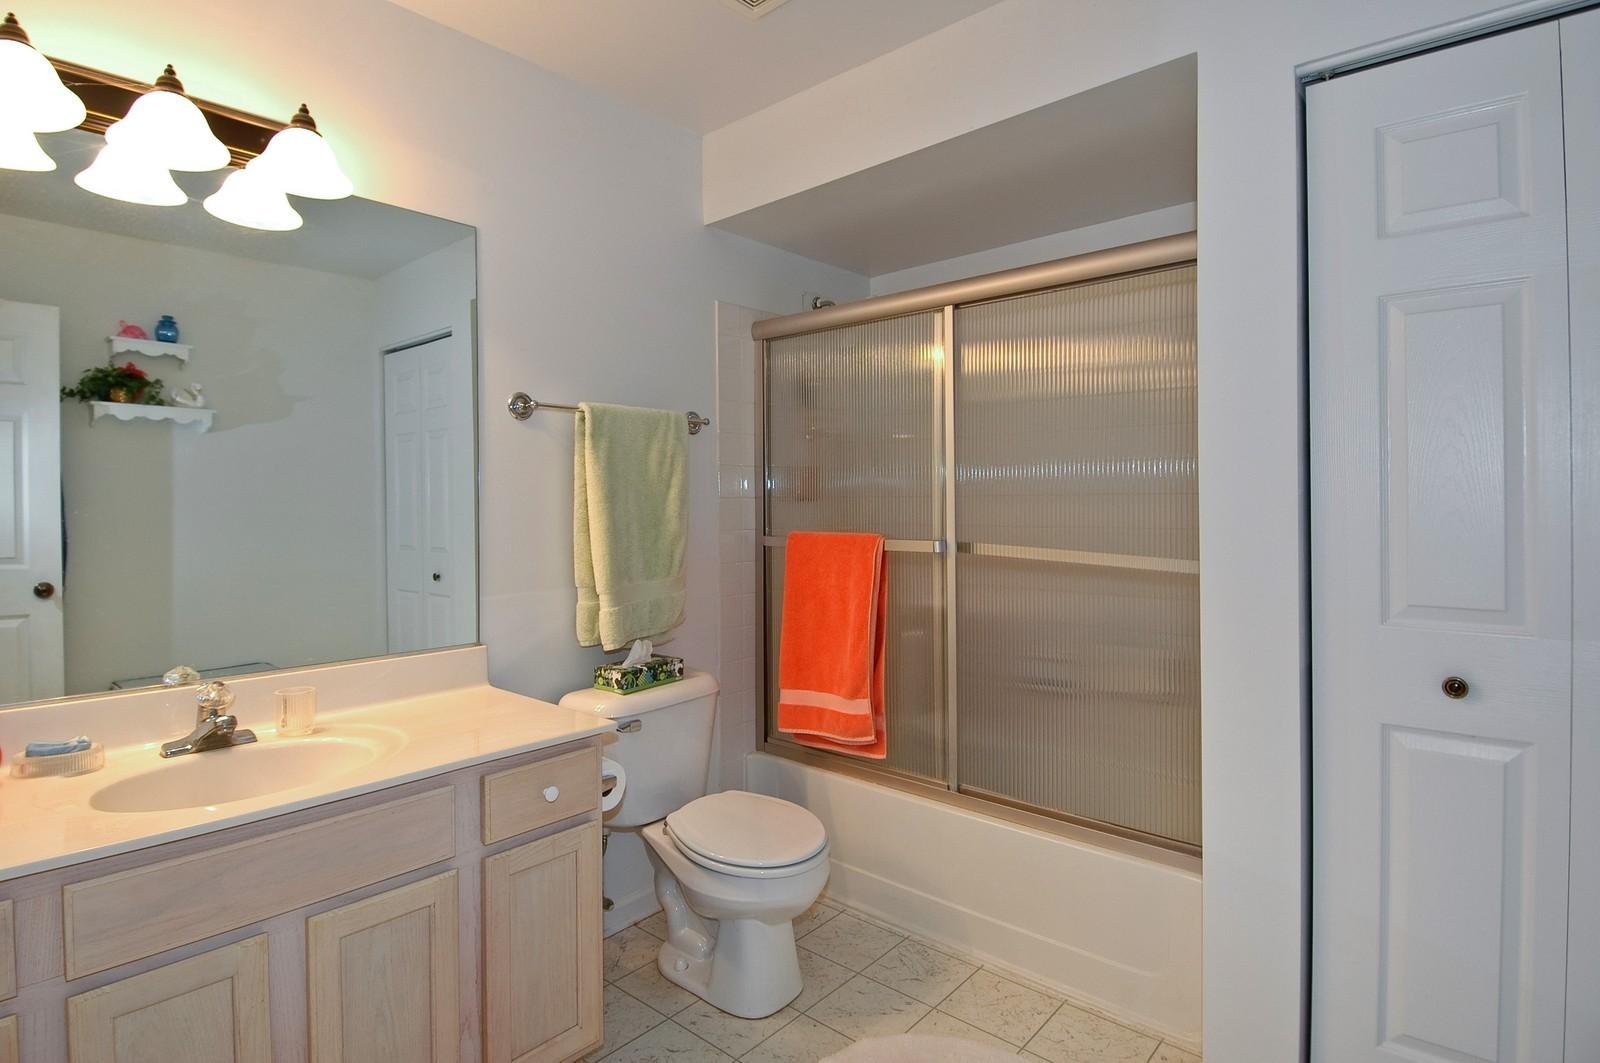 Real Estate Photography - 346 Crystal Ridge, Crystal Lake, IL, 60014 - Master Bathroom